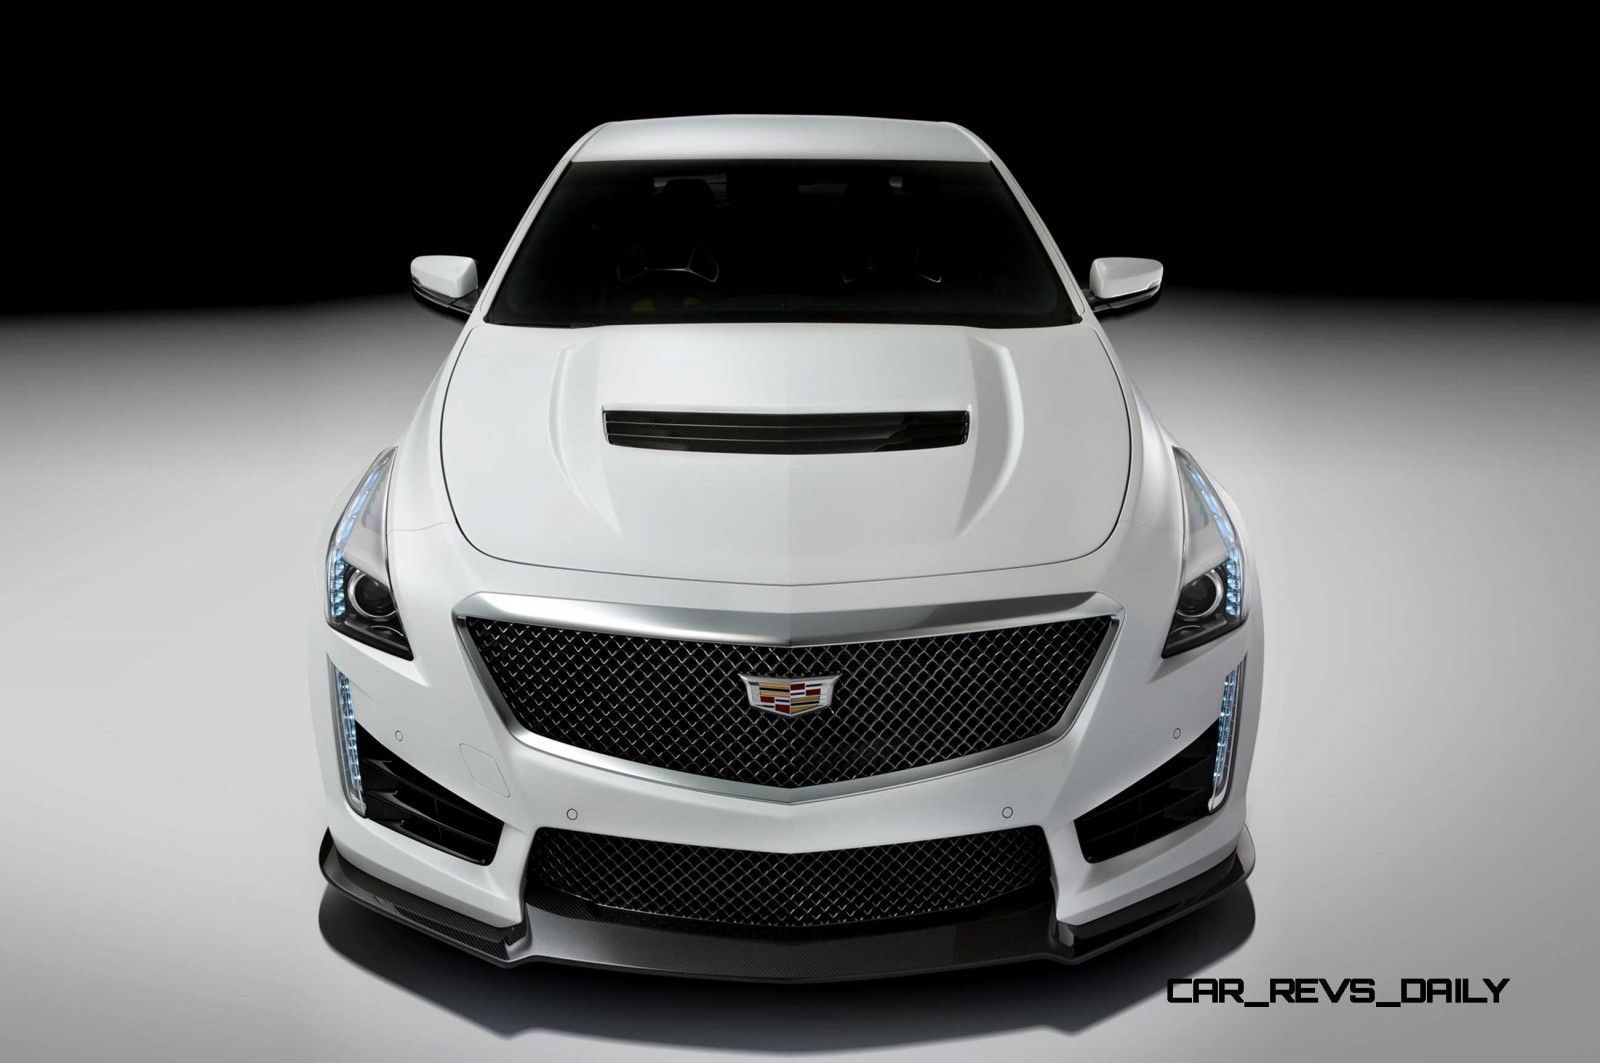 2016 Cadillac Cts V Crystal White Tricoat 2